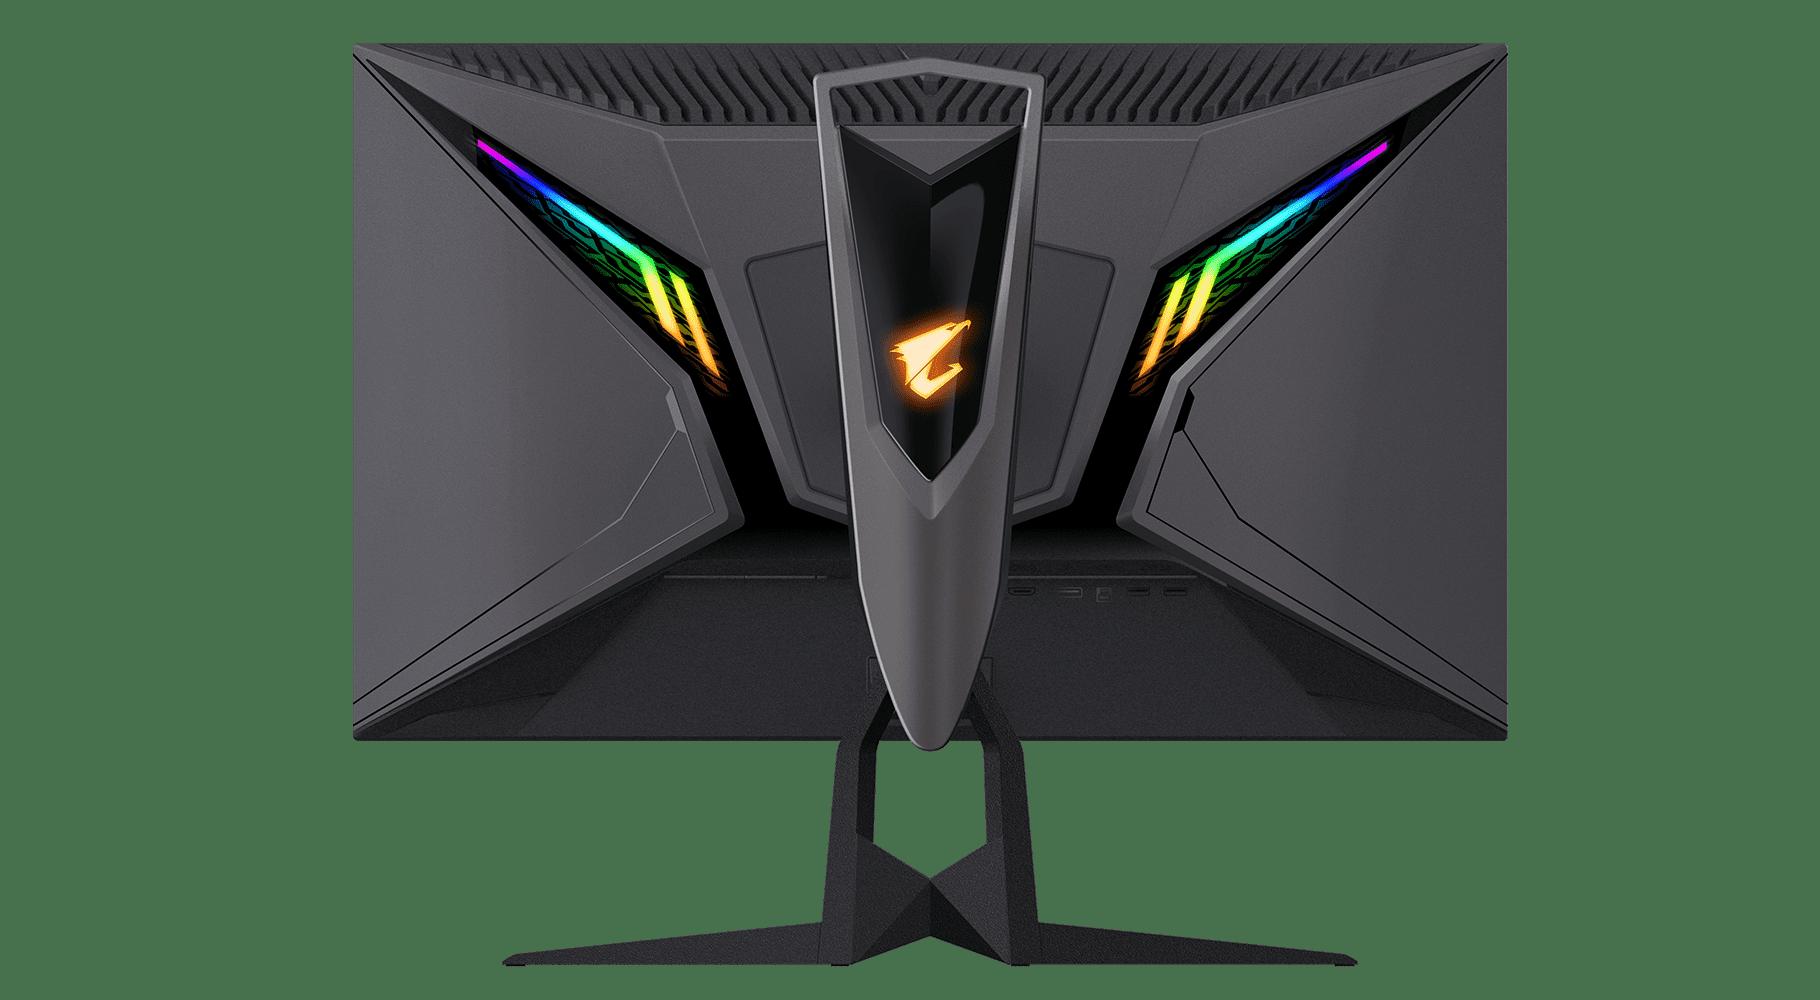 Aorus AD27QD Hinterseite mit LEDs